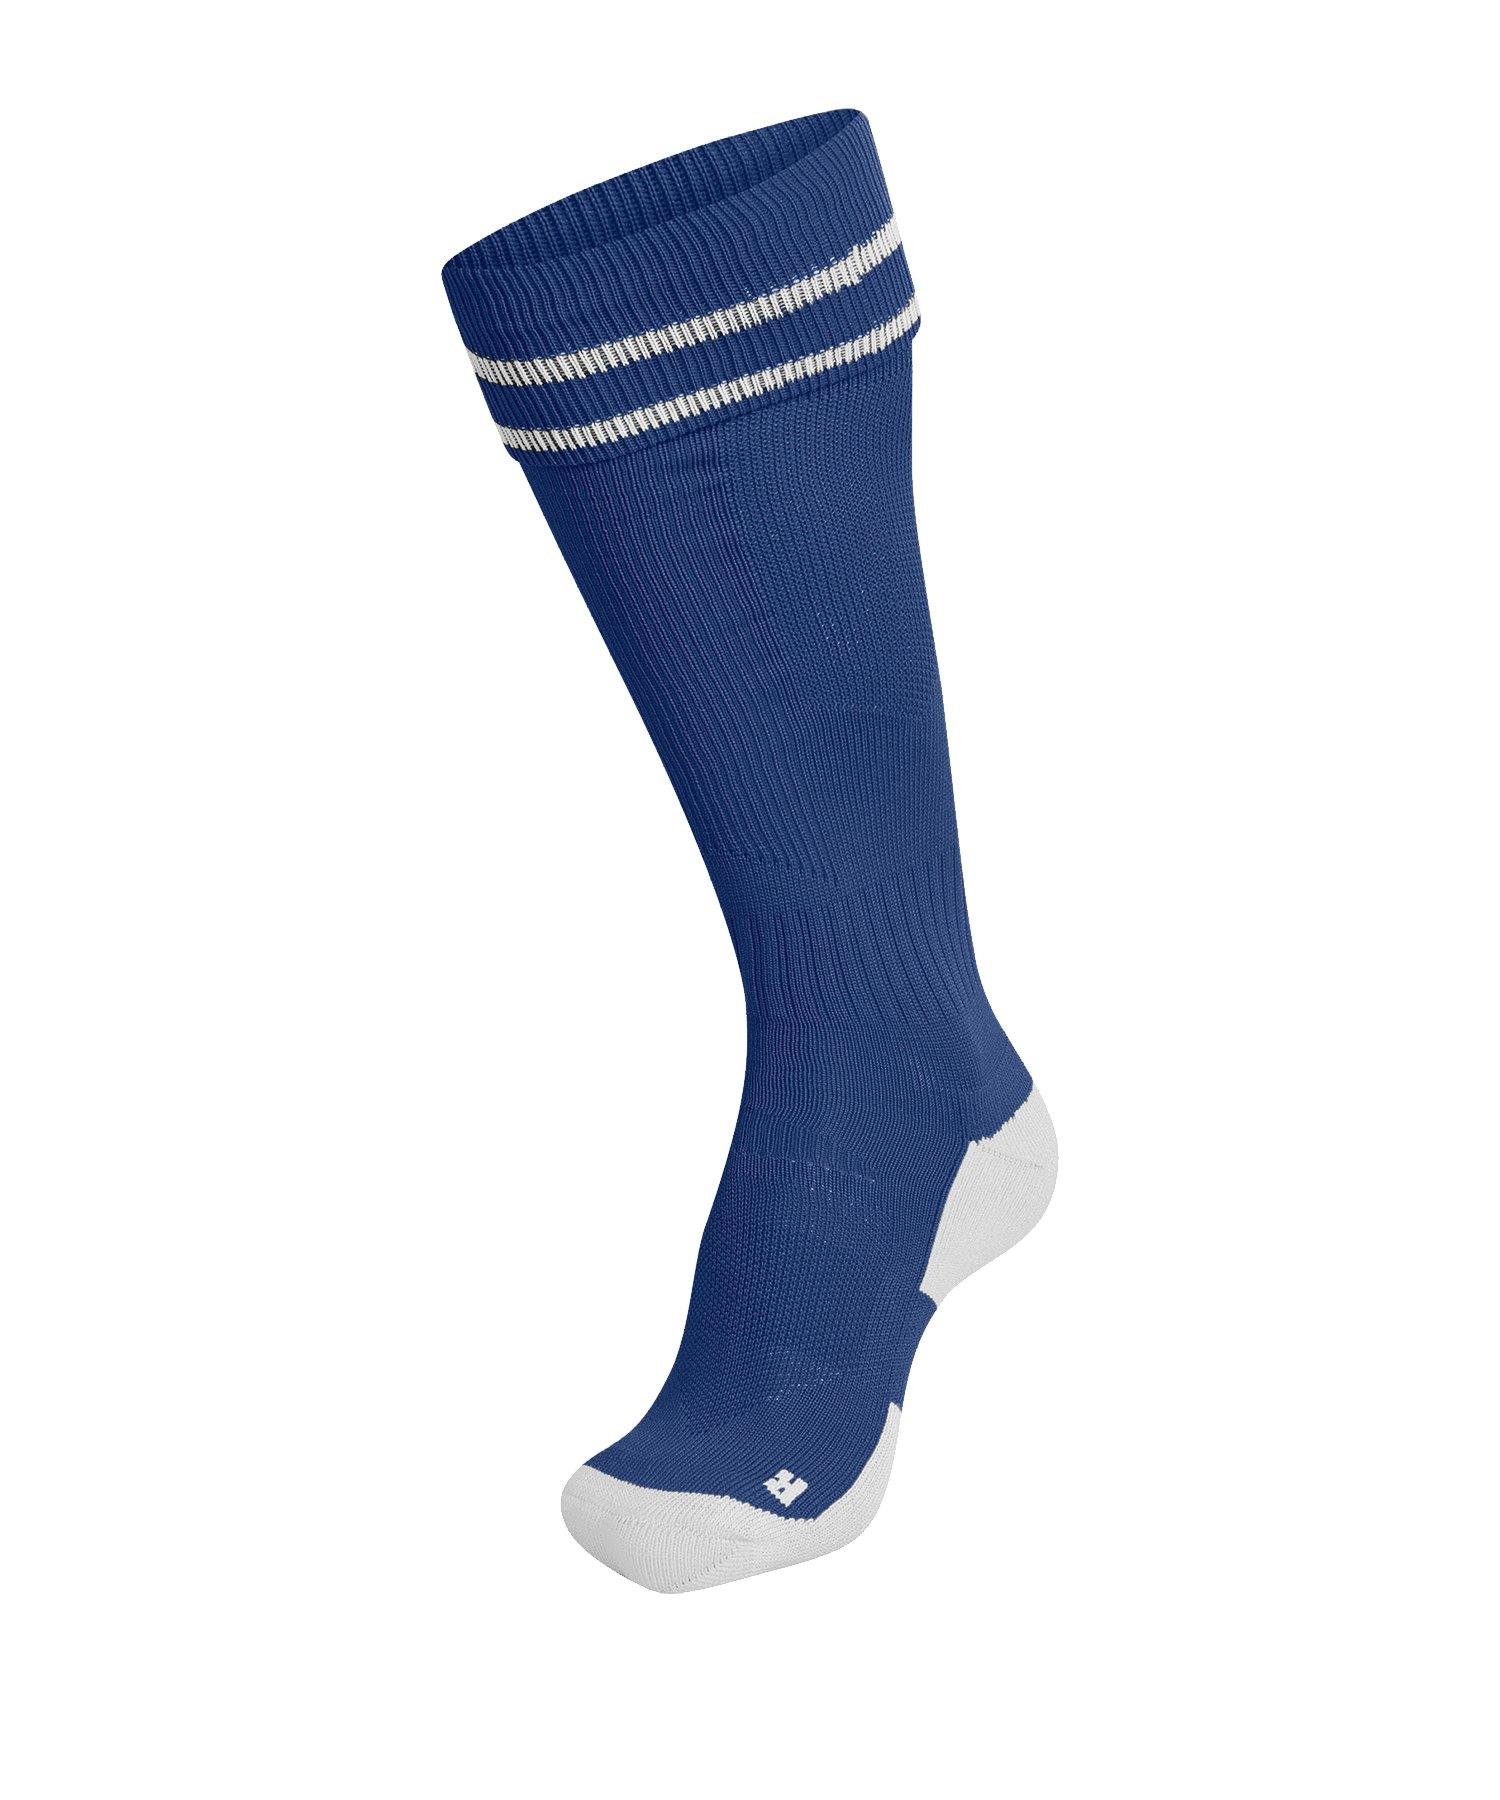 Hummel Football Sock Socken Blau F7691 - Blau